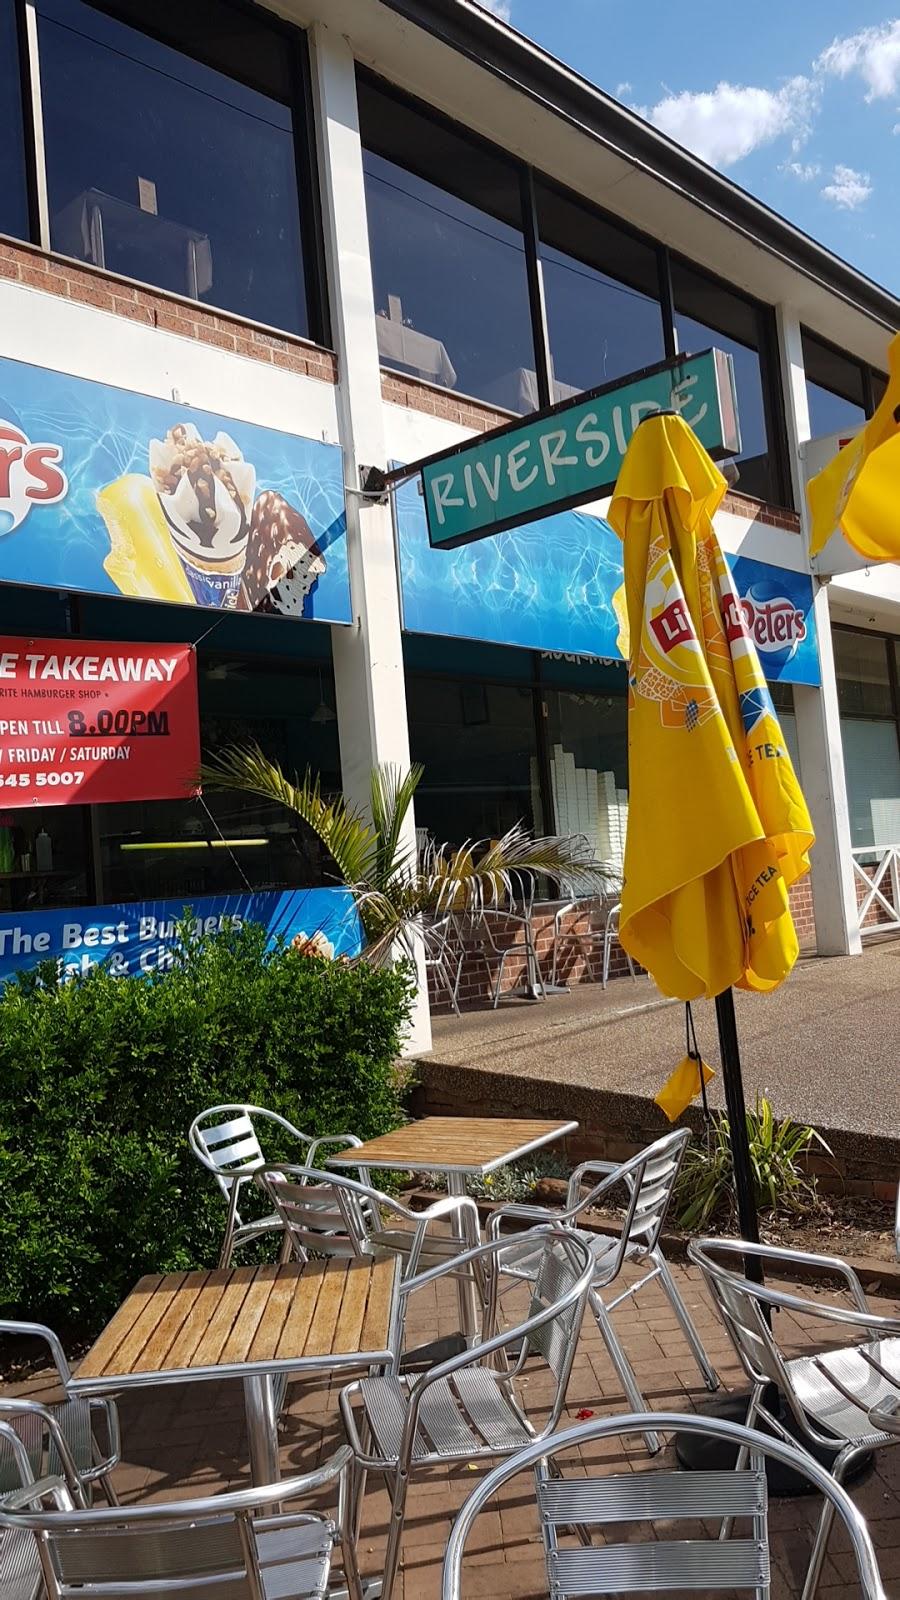 Riverside Takeaway | cafe | 1/2 Prices Circuit, Woronora NSW 2232, Australia | 0295455007 OR +61 2 9545 5007